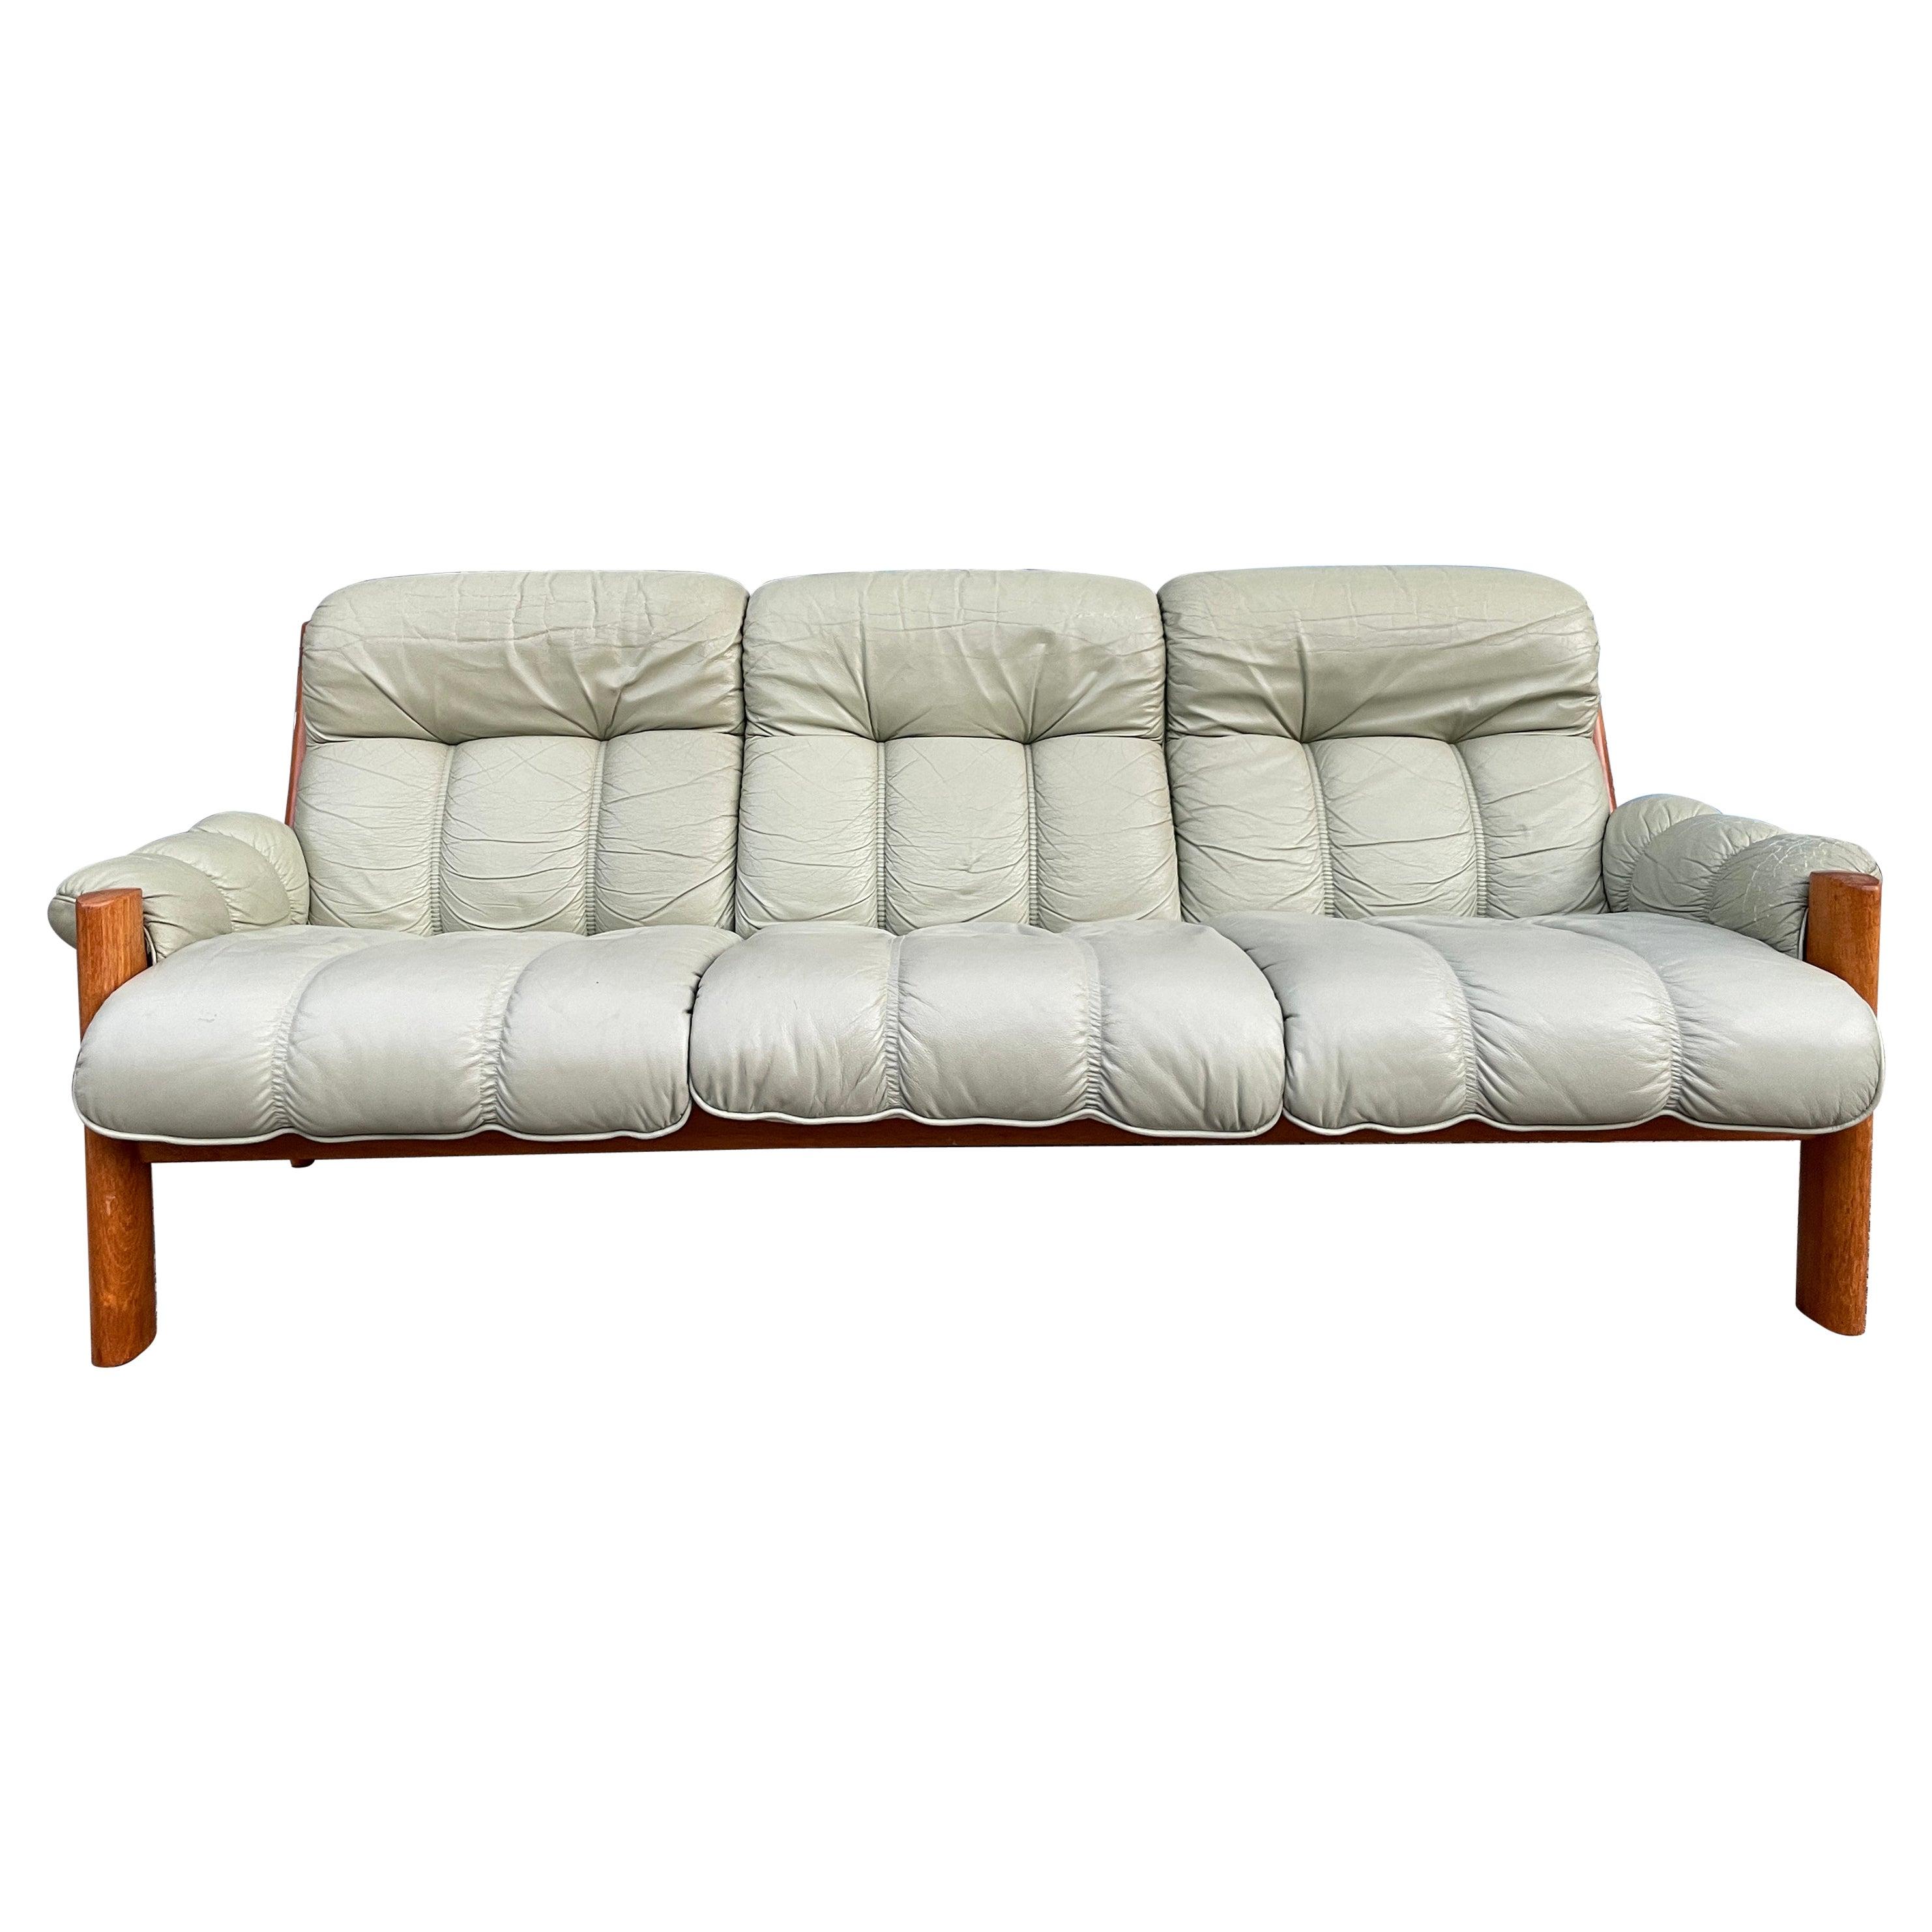 Midcentury Norwegian Modern Ekornes Leather Teak 3 Seater Sofa